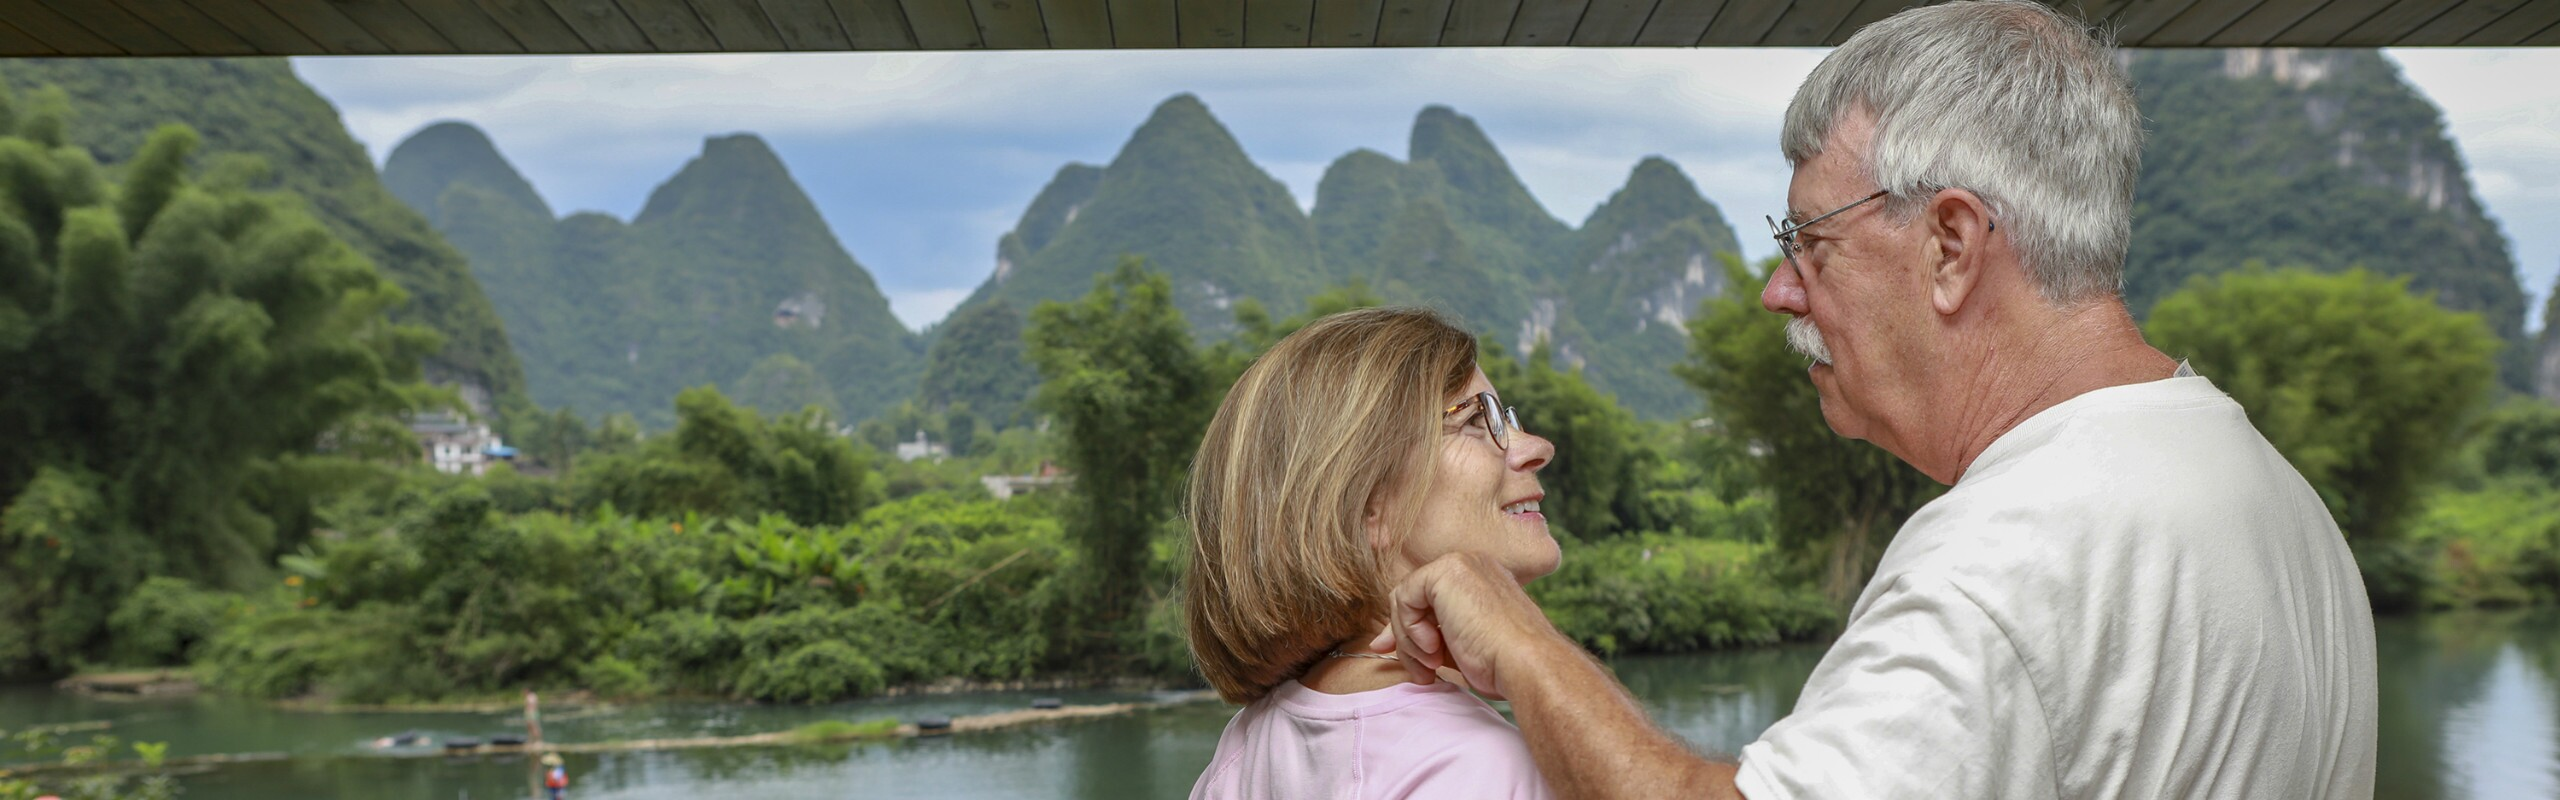 Spotlight Experiences for Romantic China Tour